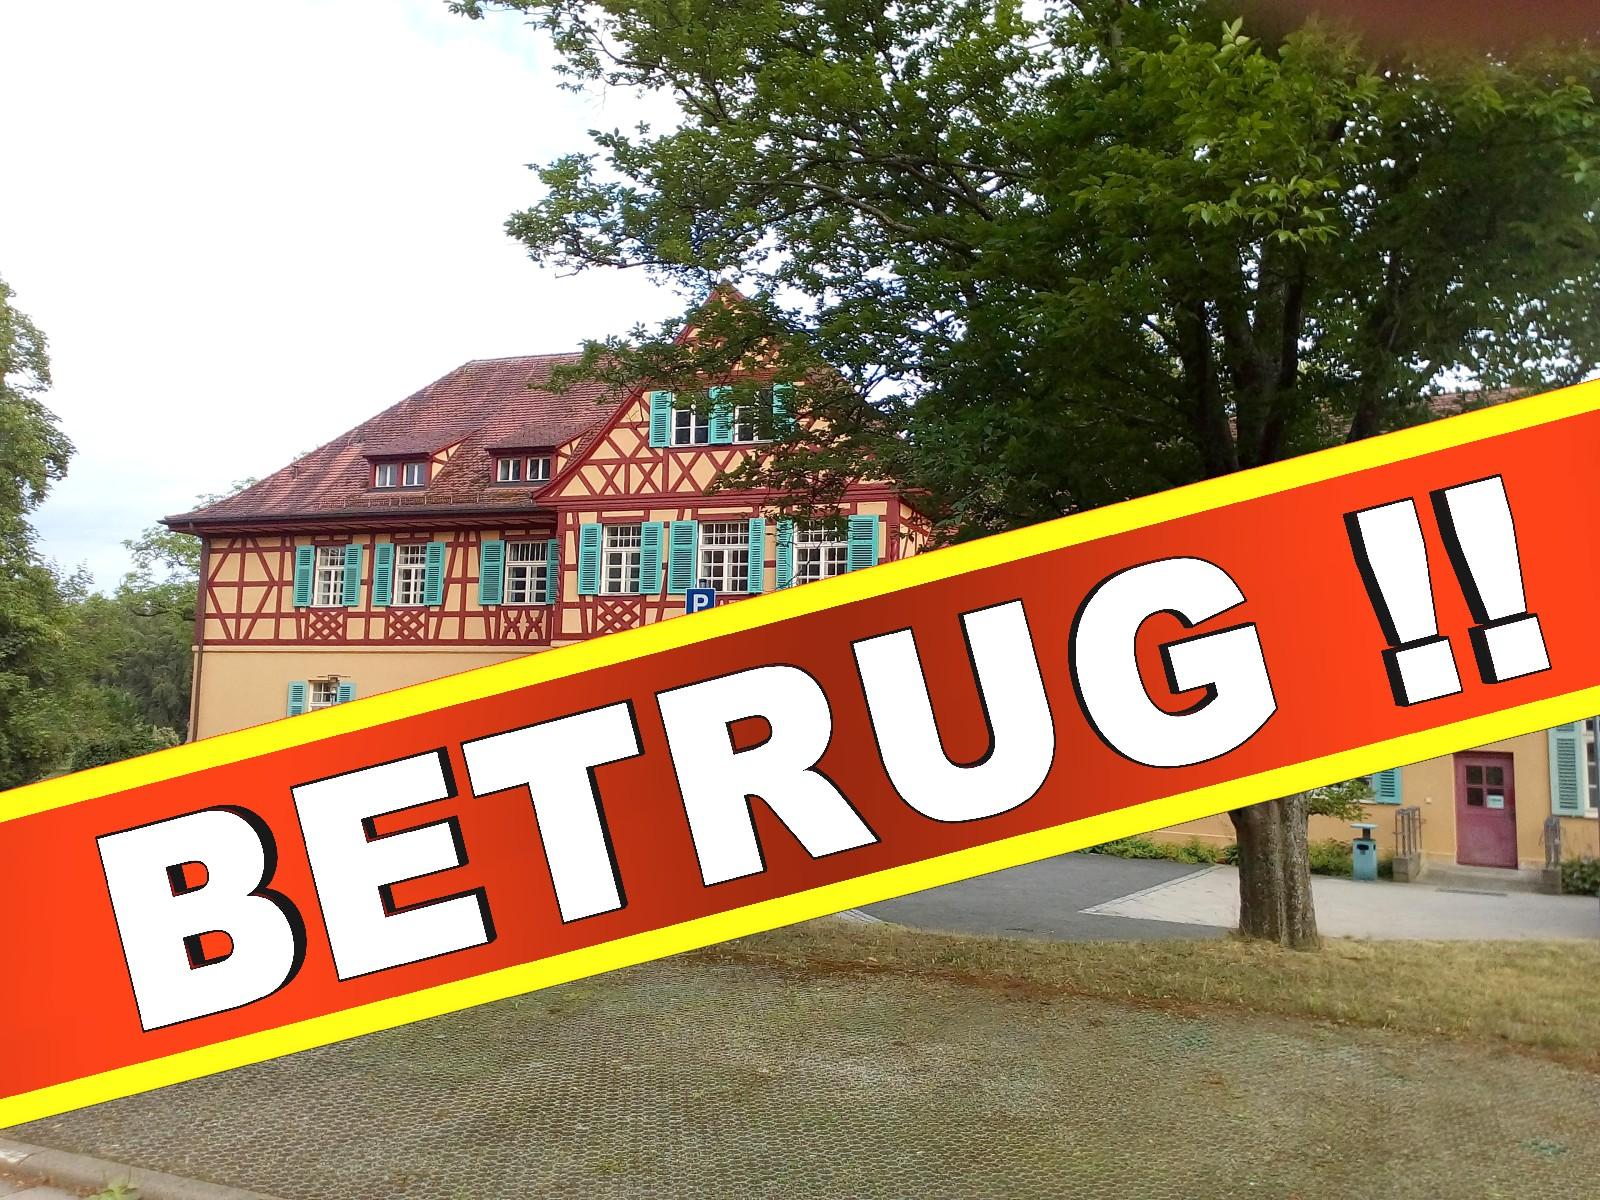 Bezirksklinikum Obermain Kutzenberg, 96250 Ebensfeld Psychiatrie Polizei Krankenhaus (50)